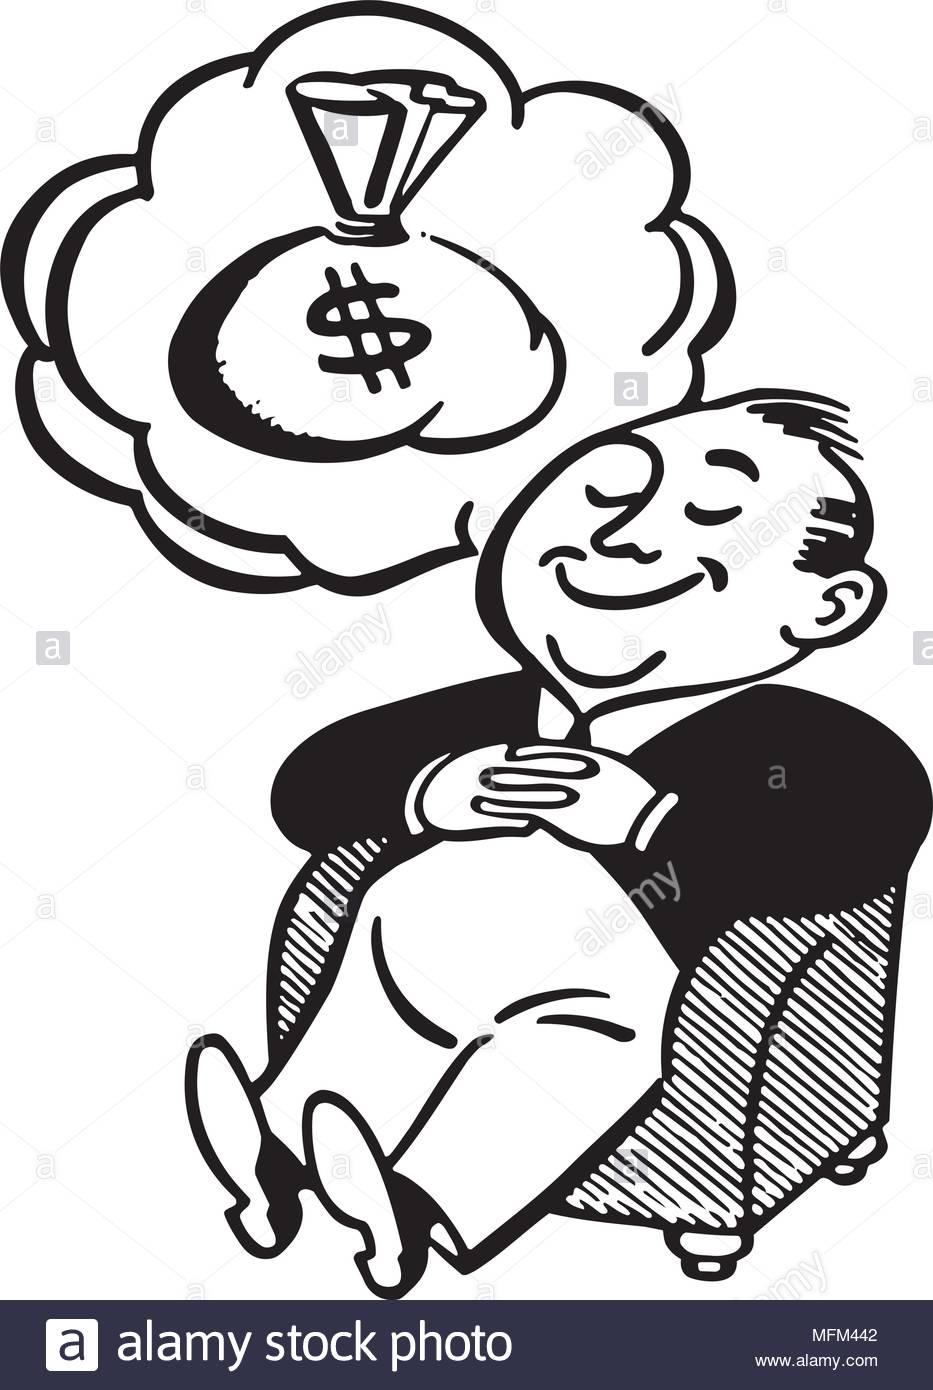 Man Dreaming Of Money.